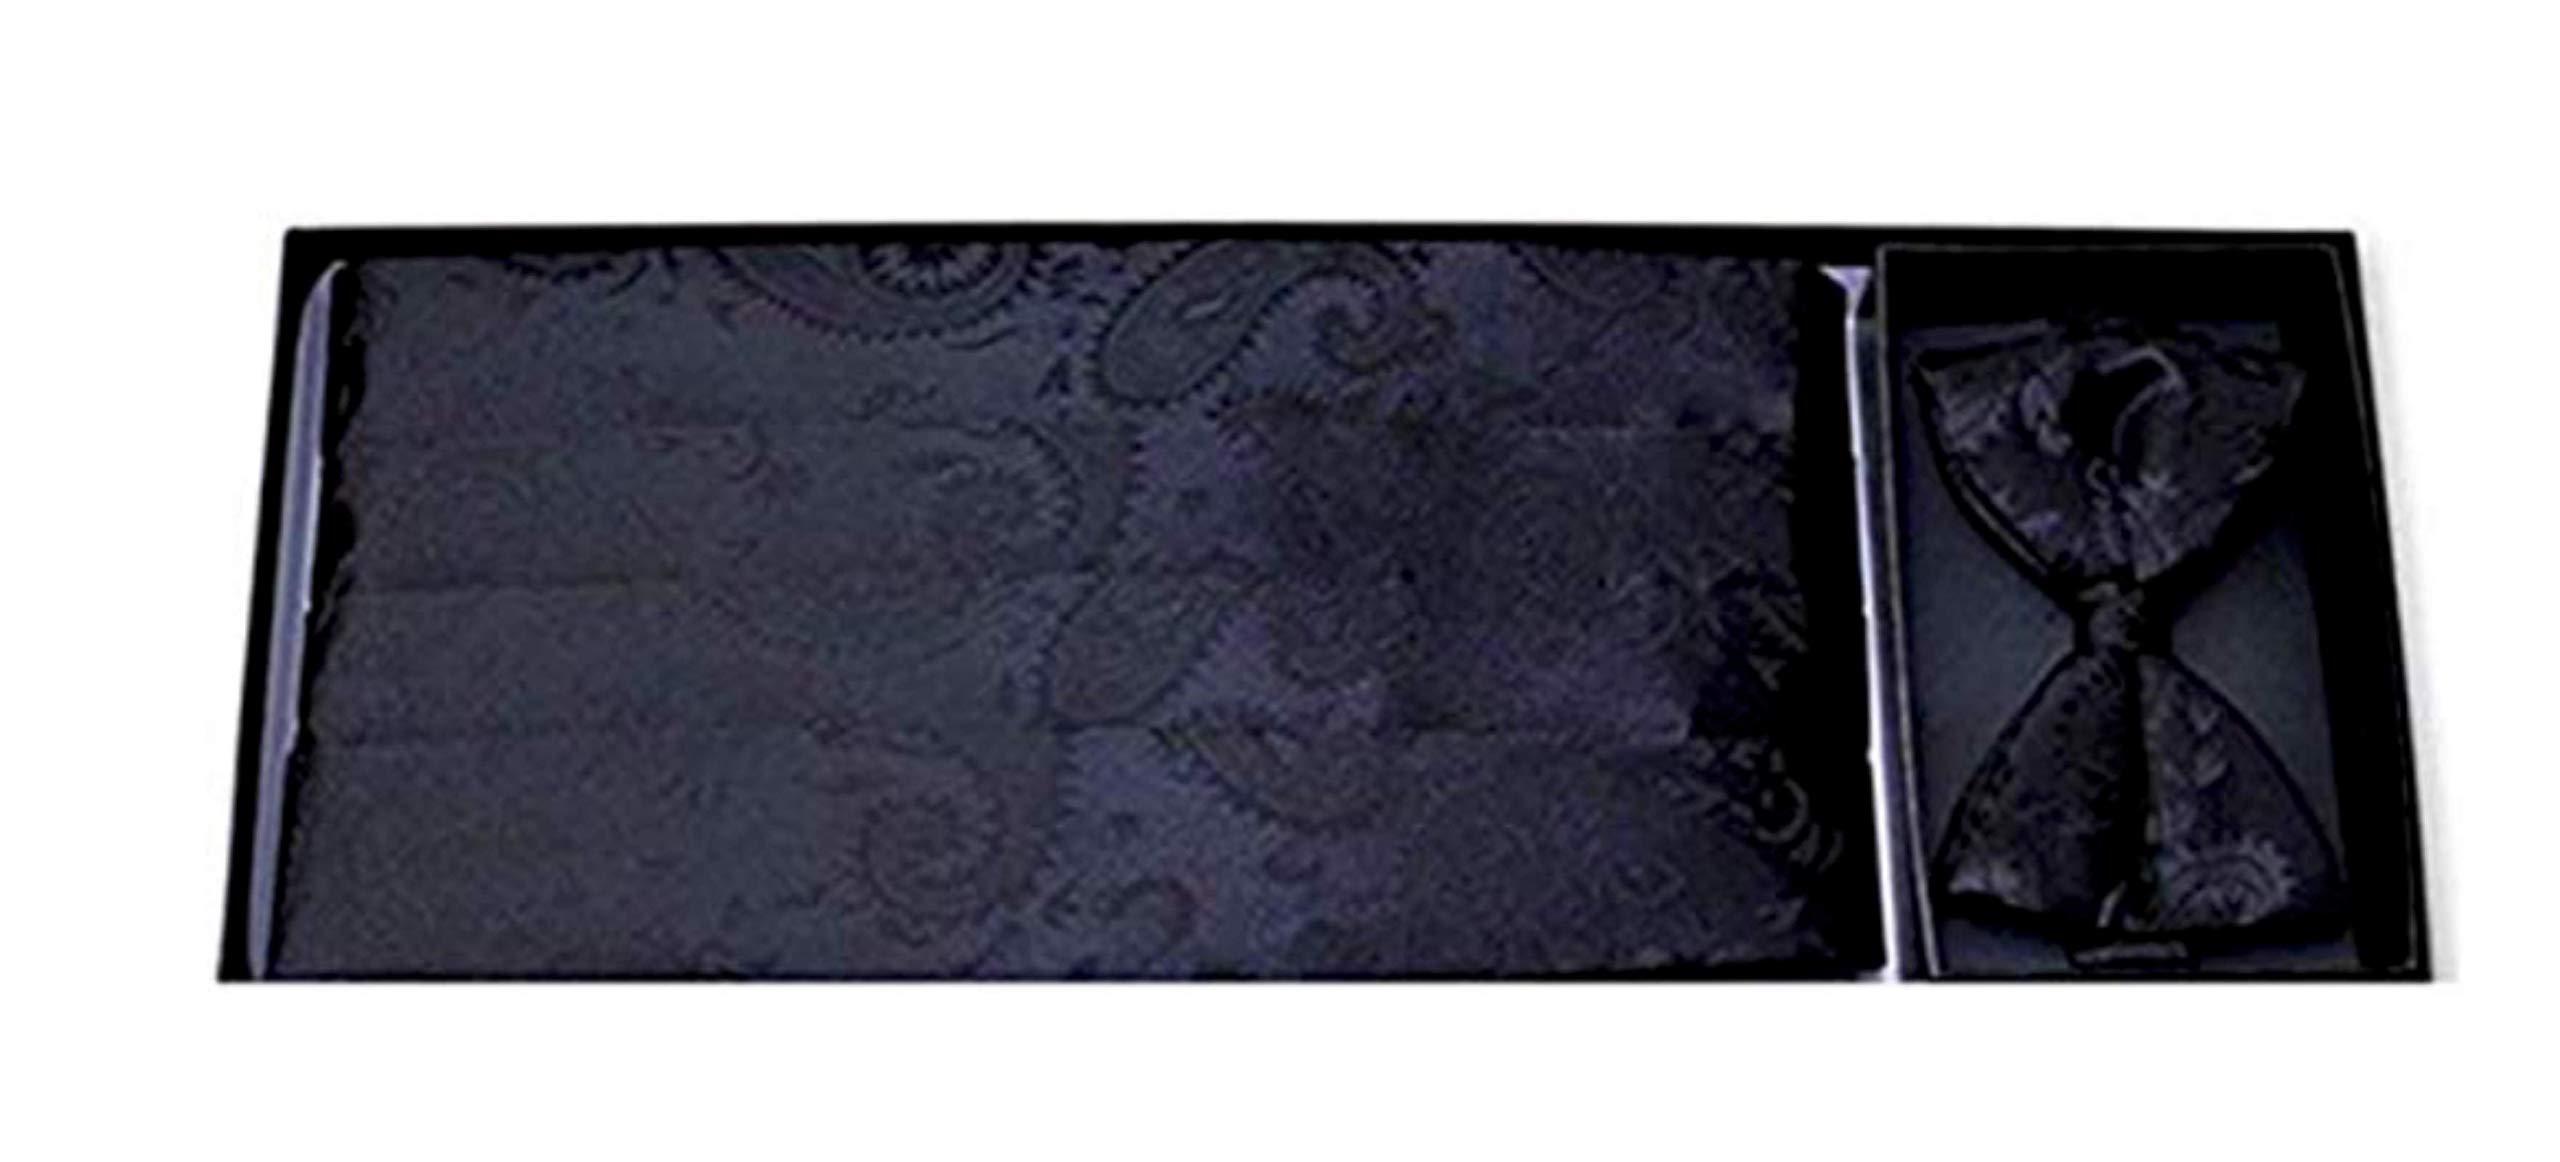 Bold Black Paisley Silk Tuxedo Cummerbund and Bow Tie by David's Formal Wear